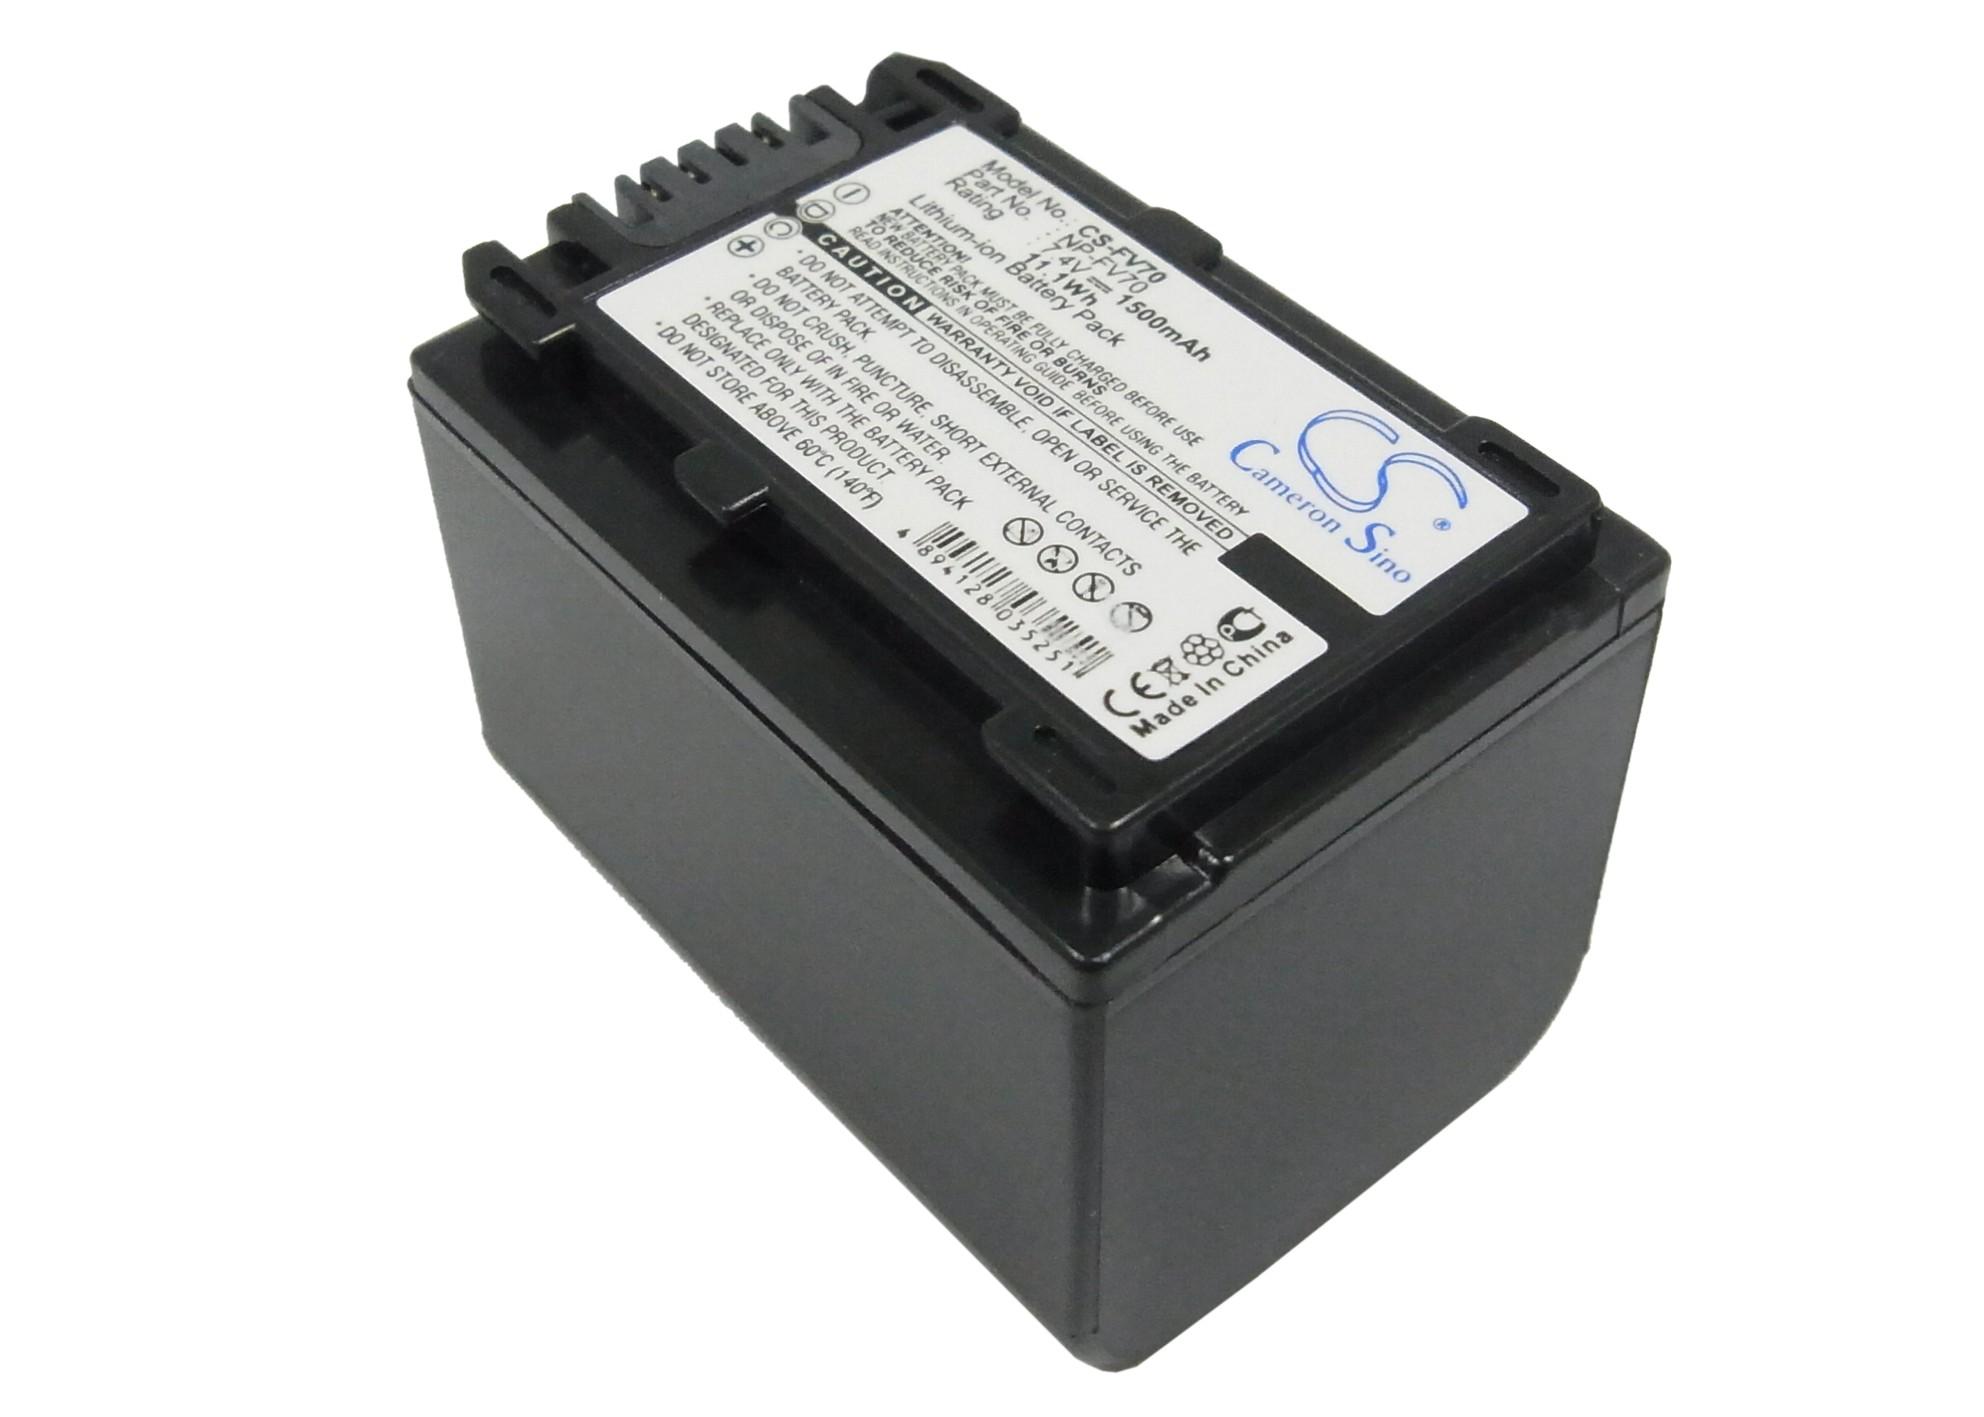 Cameron Sino baterie do kamer a fotoaparátů pro SONY DCR-SX73E 7.4V Li-ion 1500mAh černá - neoriginální